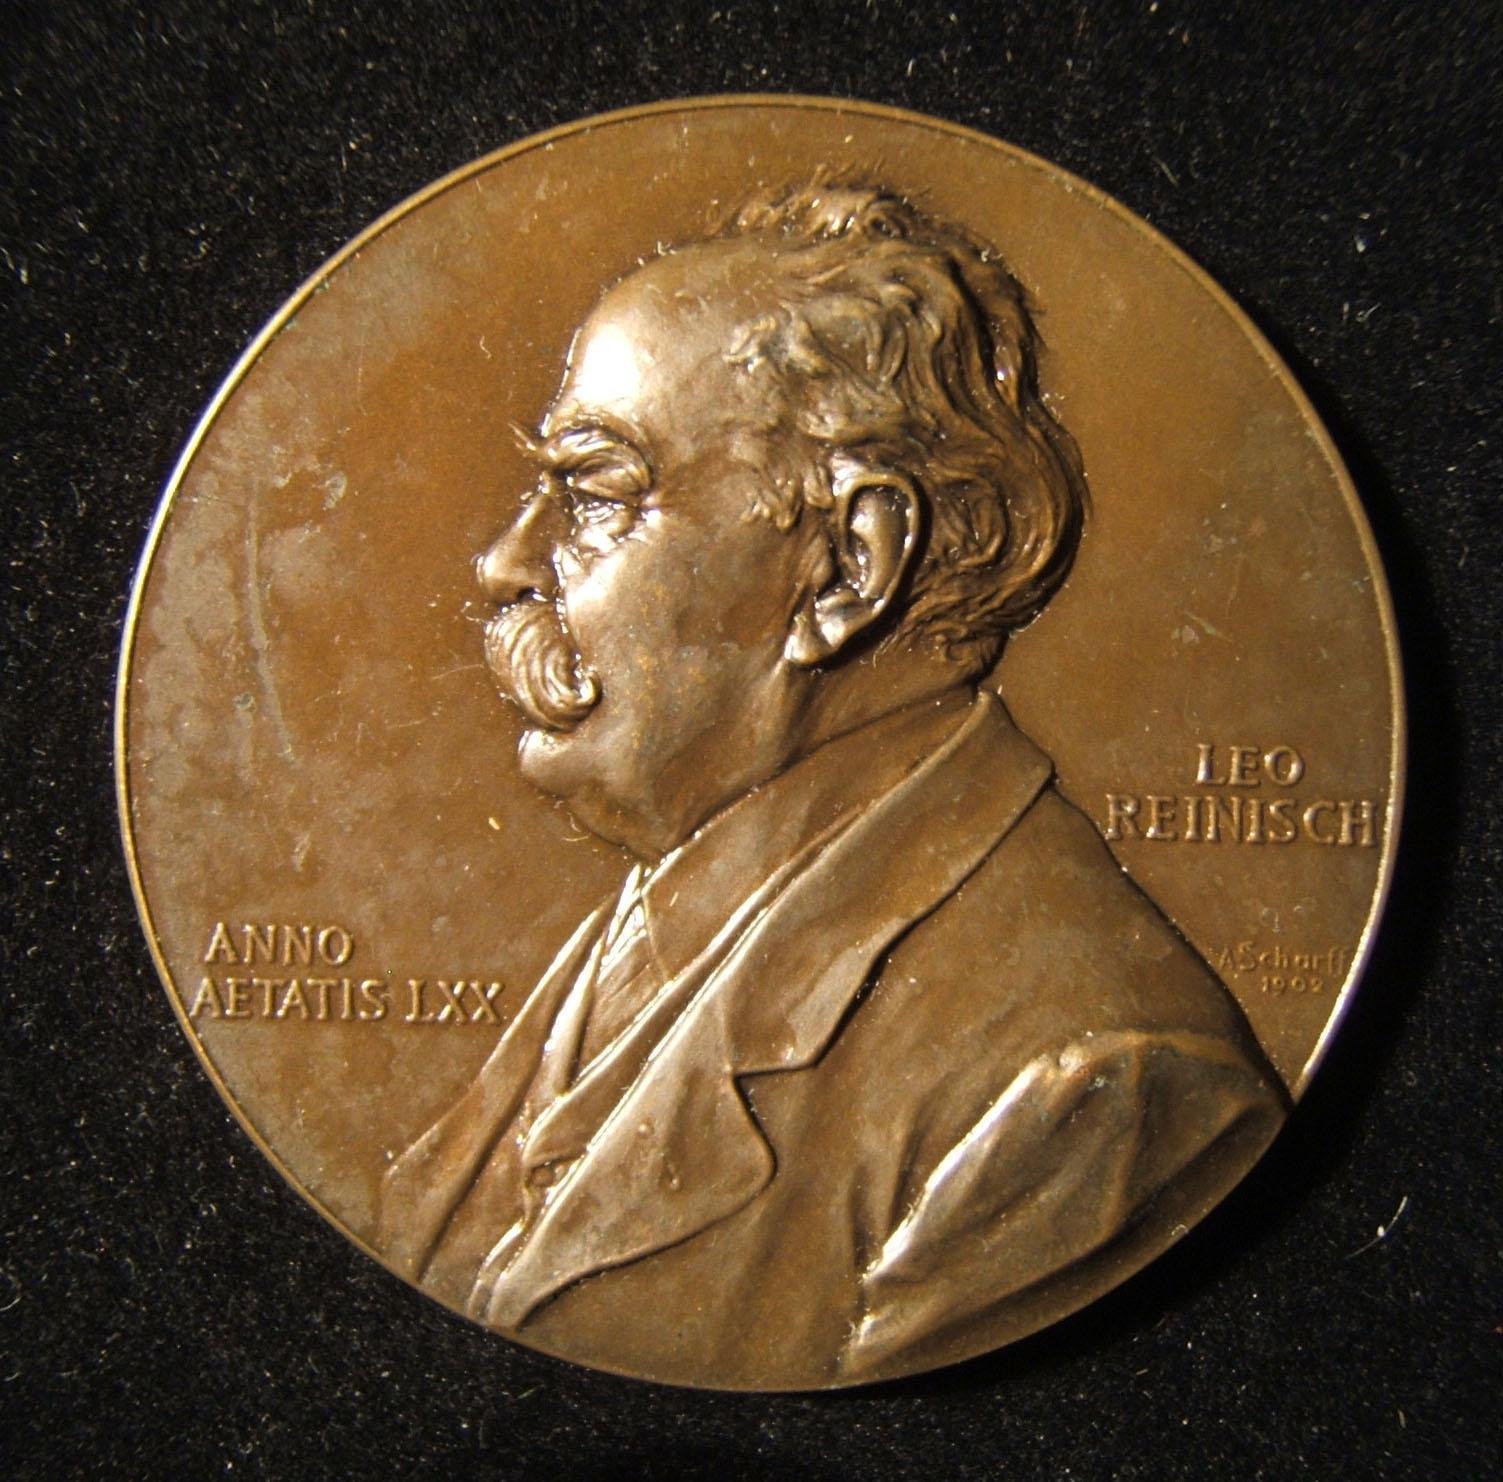 Austria: Professor Leo Reinisch 70th birthday bronze commemorative medal by Anton Scharff, 1902; size: 47mm; weight: 44.65g. Obv.: left-facing Reinisch w/ name at right & Schar